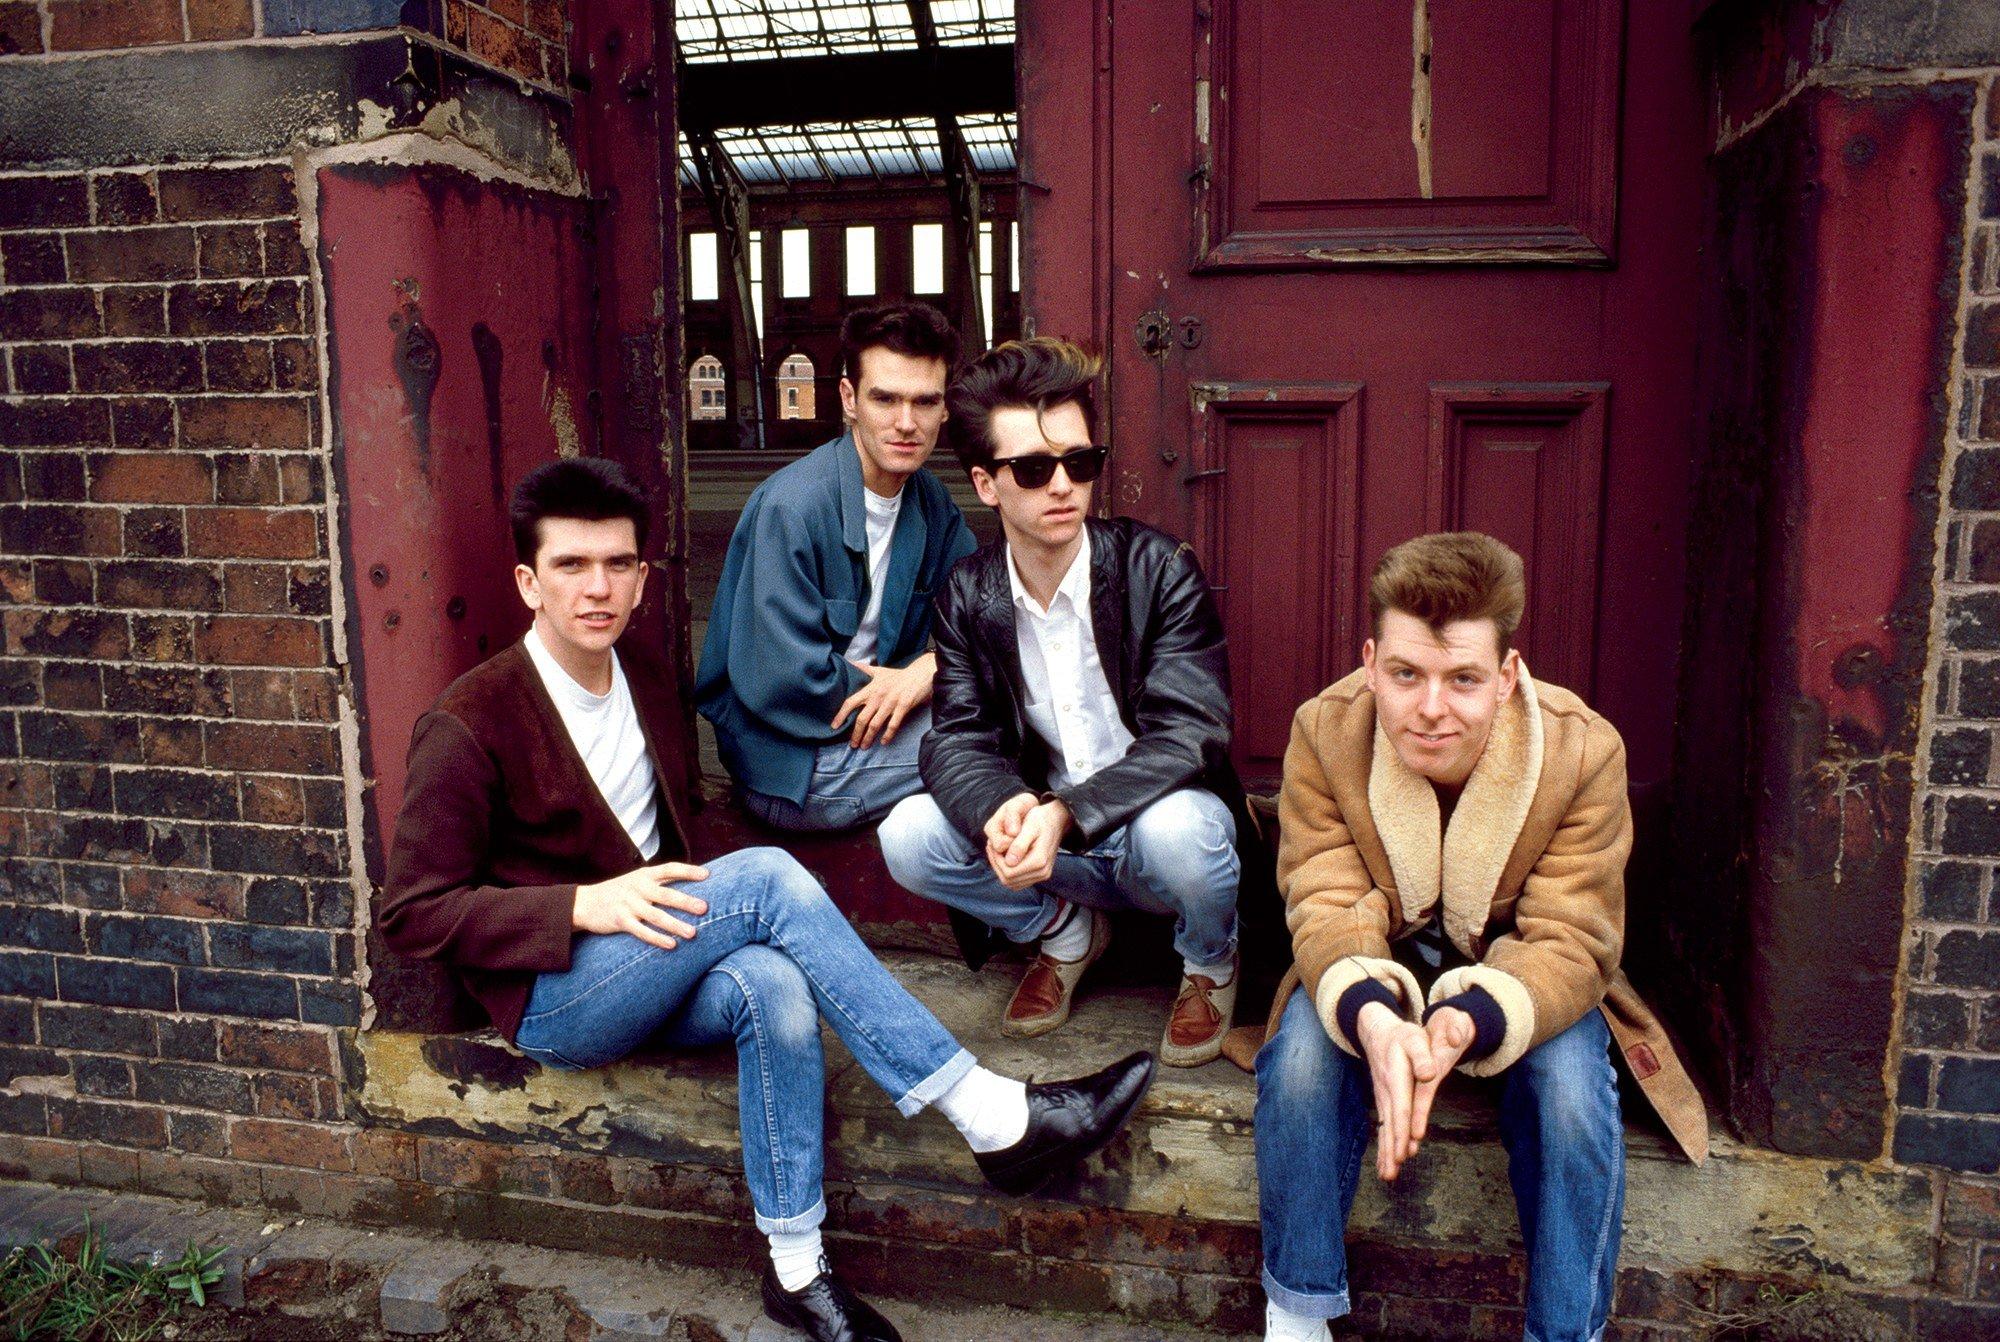 Группа The Smiths выпустила пластинку спредостережением оДональде Трампе